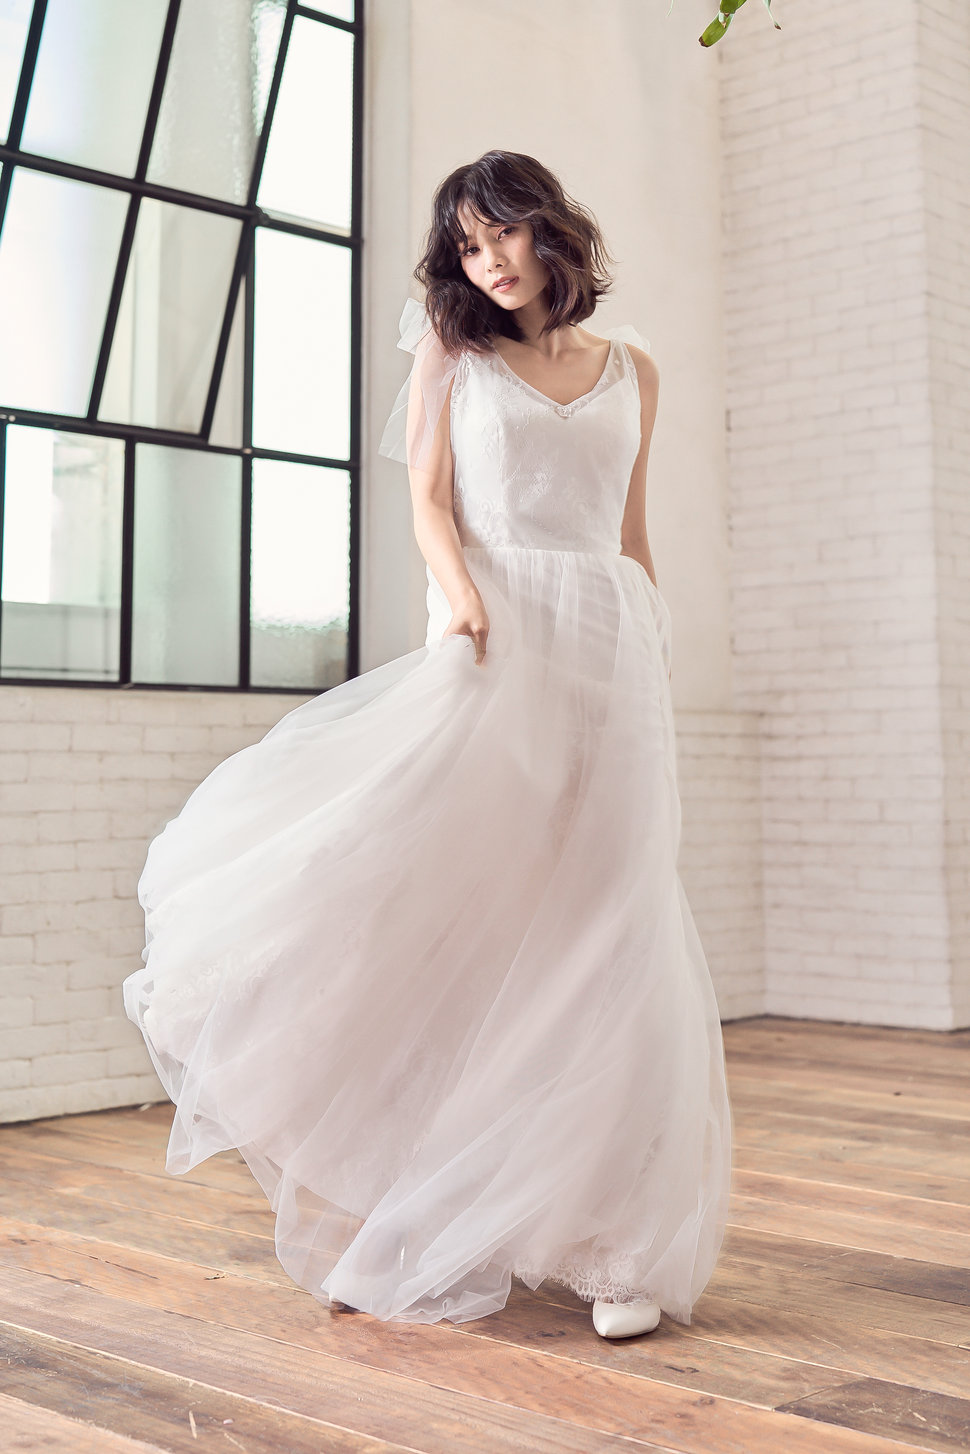 190731_0369 - Mikeshi wedding 米娔詩手《結婚吧》